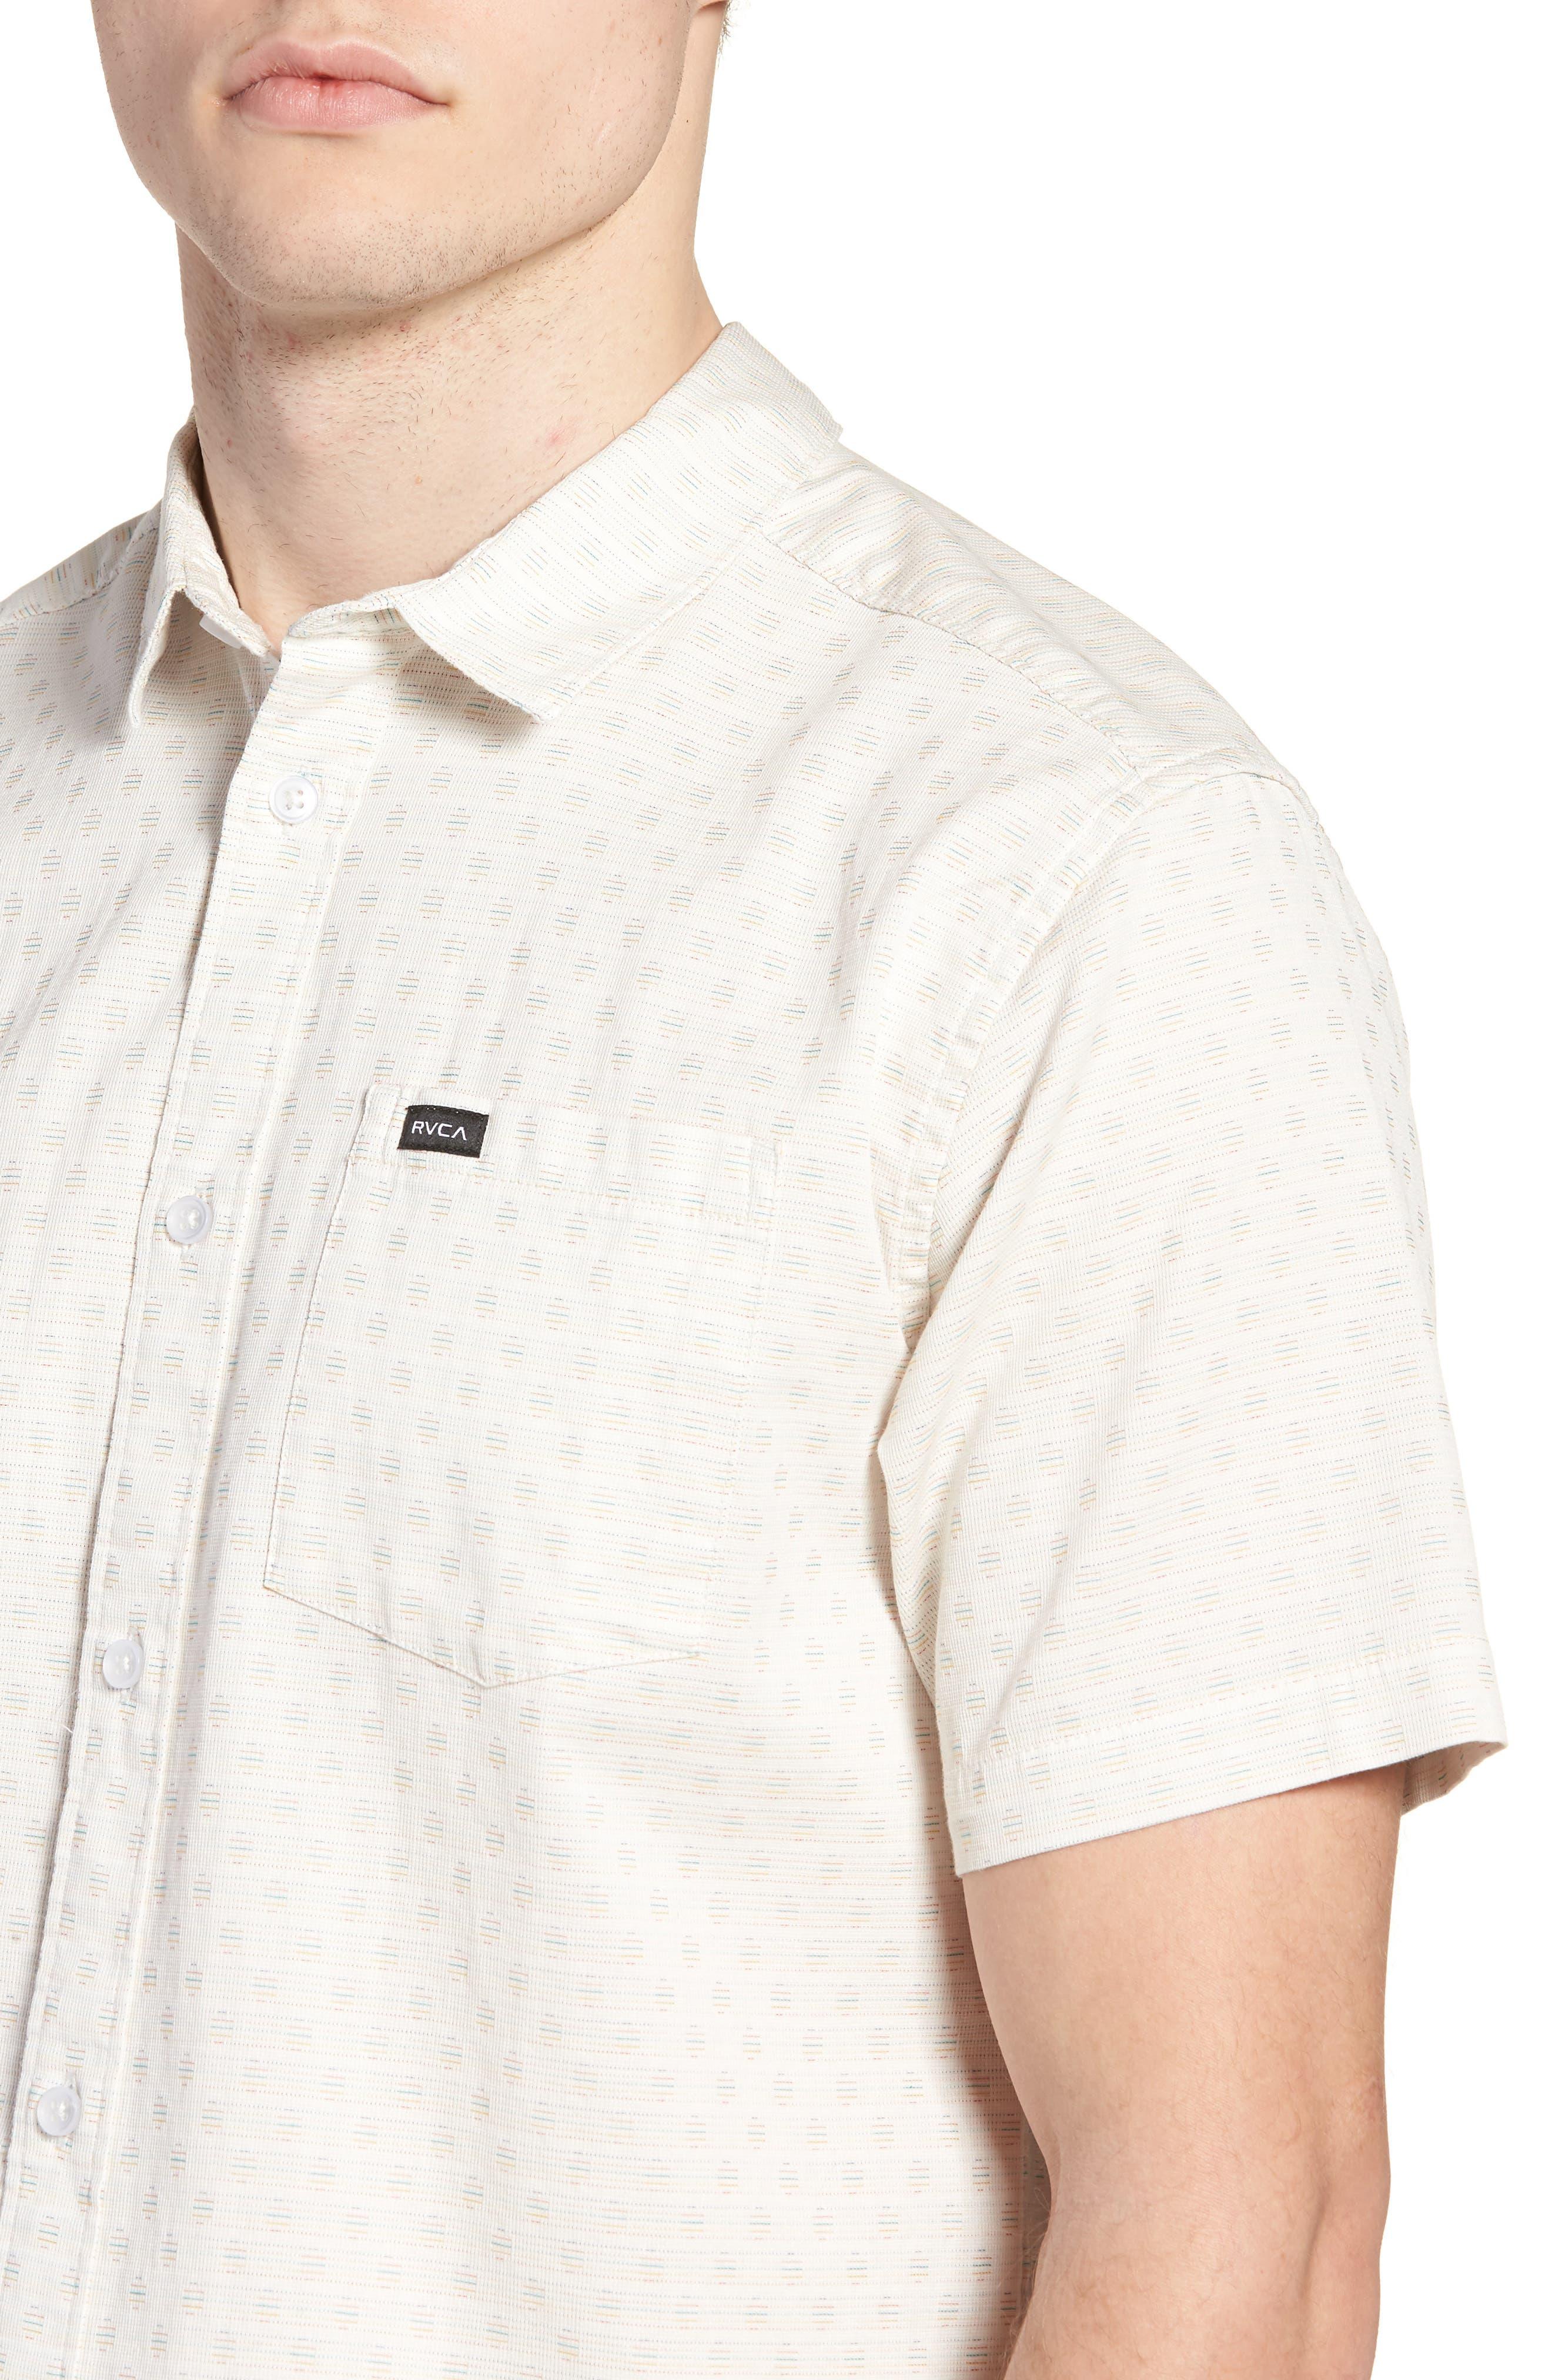 D2 Woven Shirt,                             Alternate thumbnail 4, color,                             900